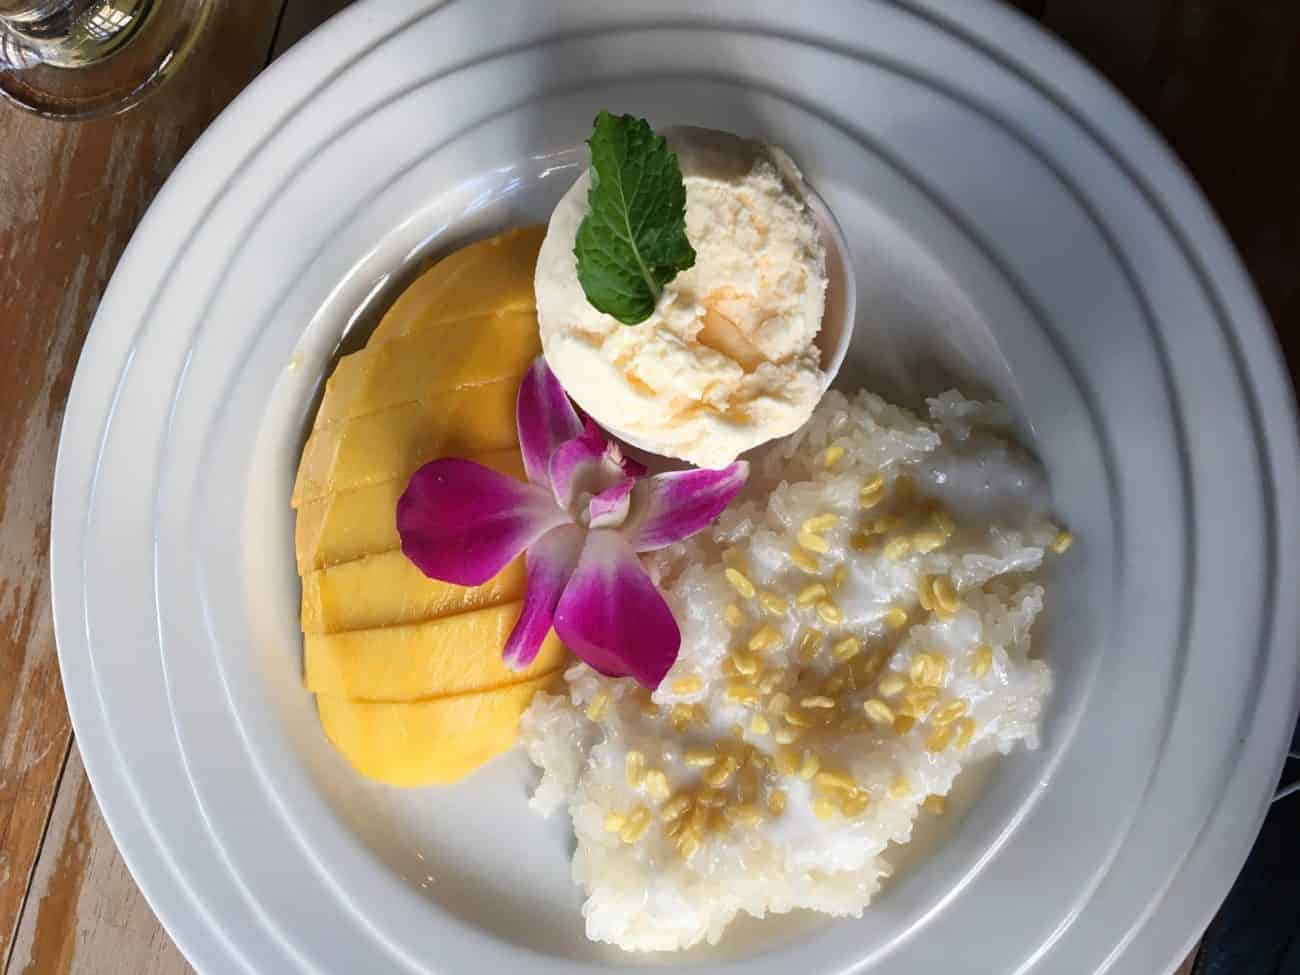 Mango sticky rice in Thailand